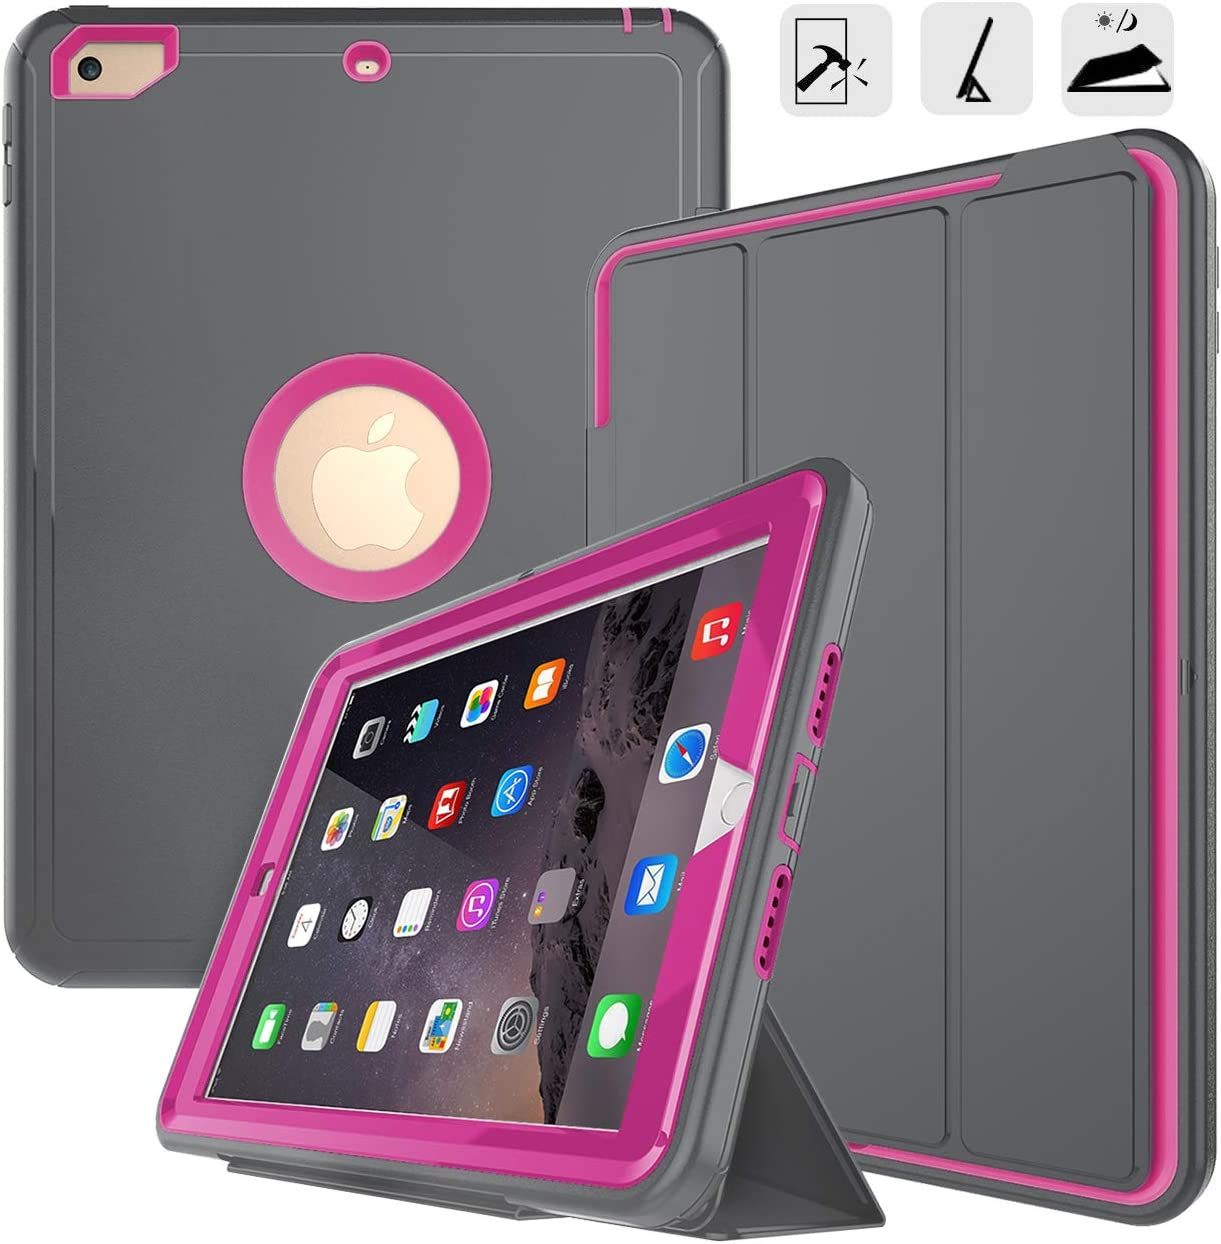 iPad 9.7 2017/2018 case-DUNNO Grid Non Slip Surface Three Layer Heavy Duty Full Body Protective Case for Apple iPad 9.7 2017, iPad (5th Generation) (Grey/Rose)